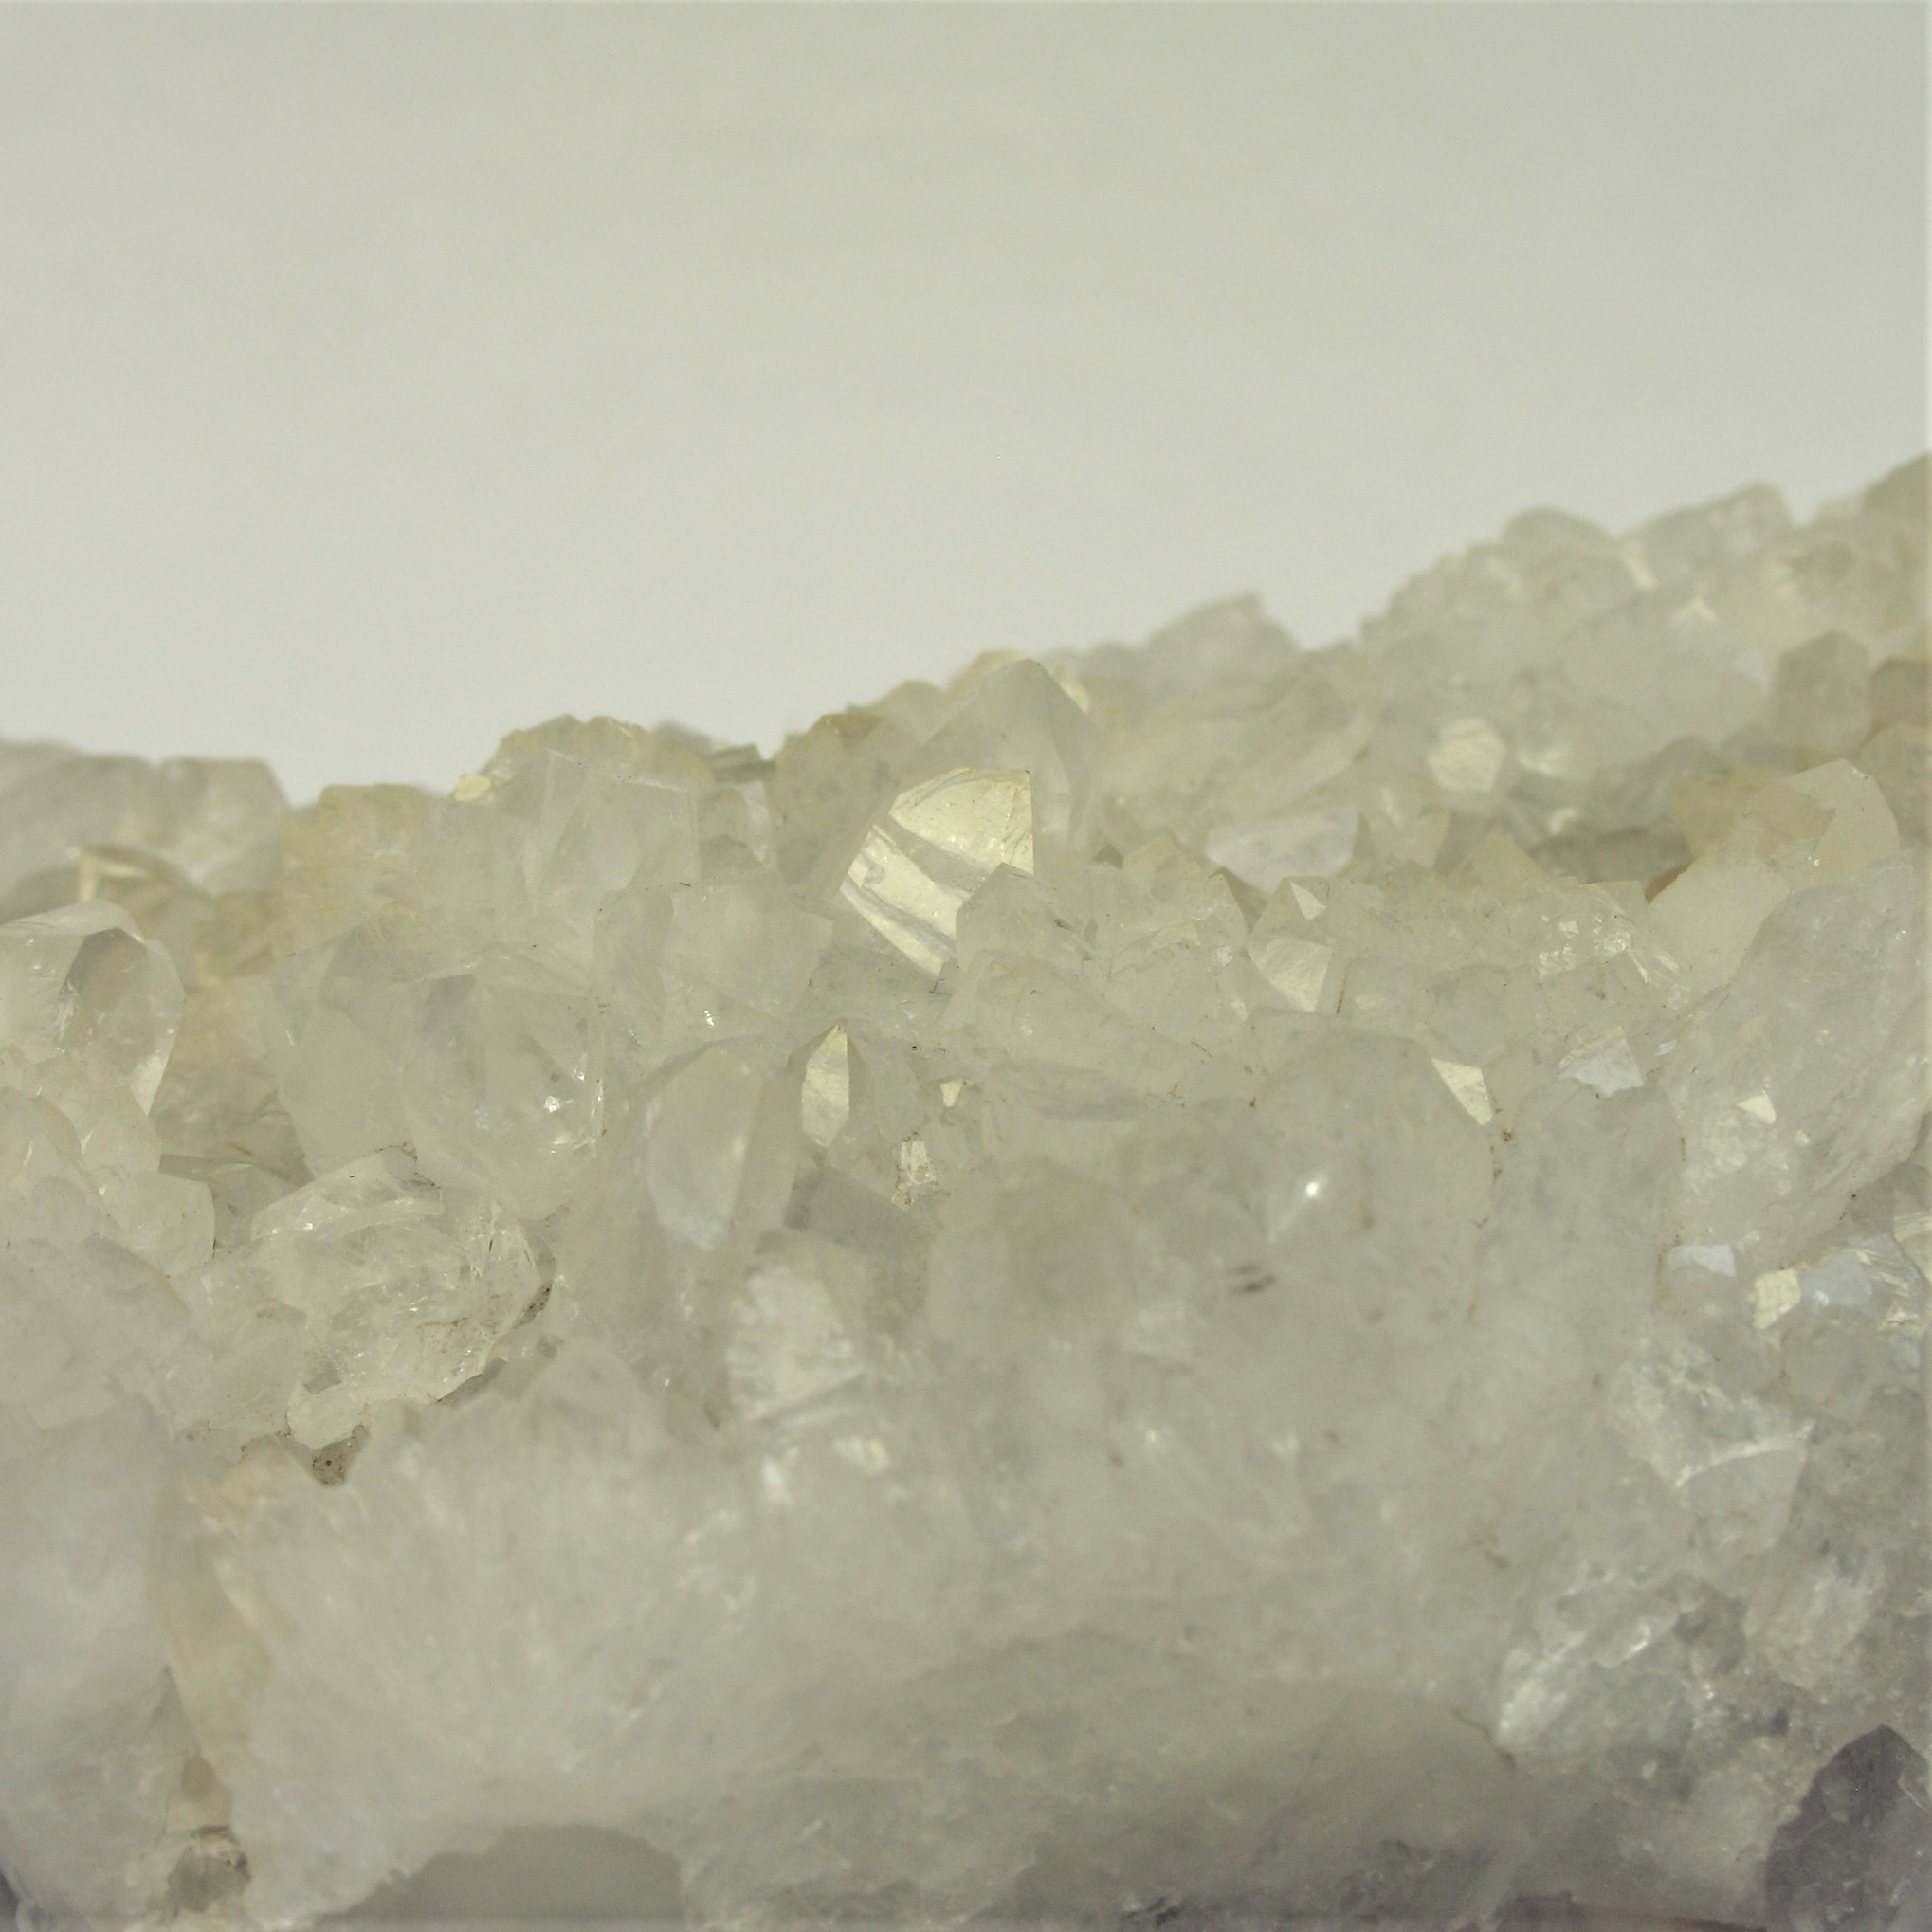 Ruwe kristallen